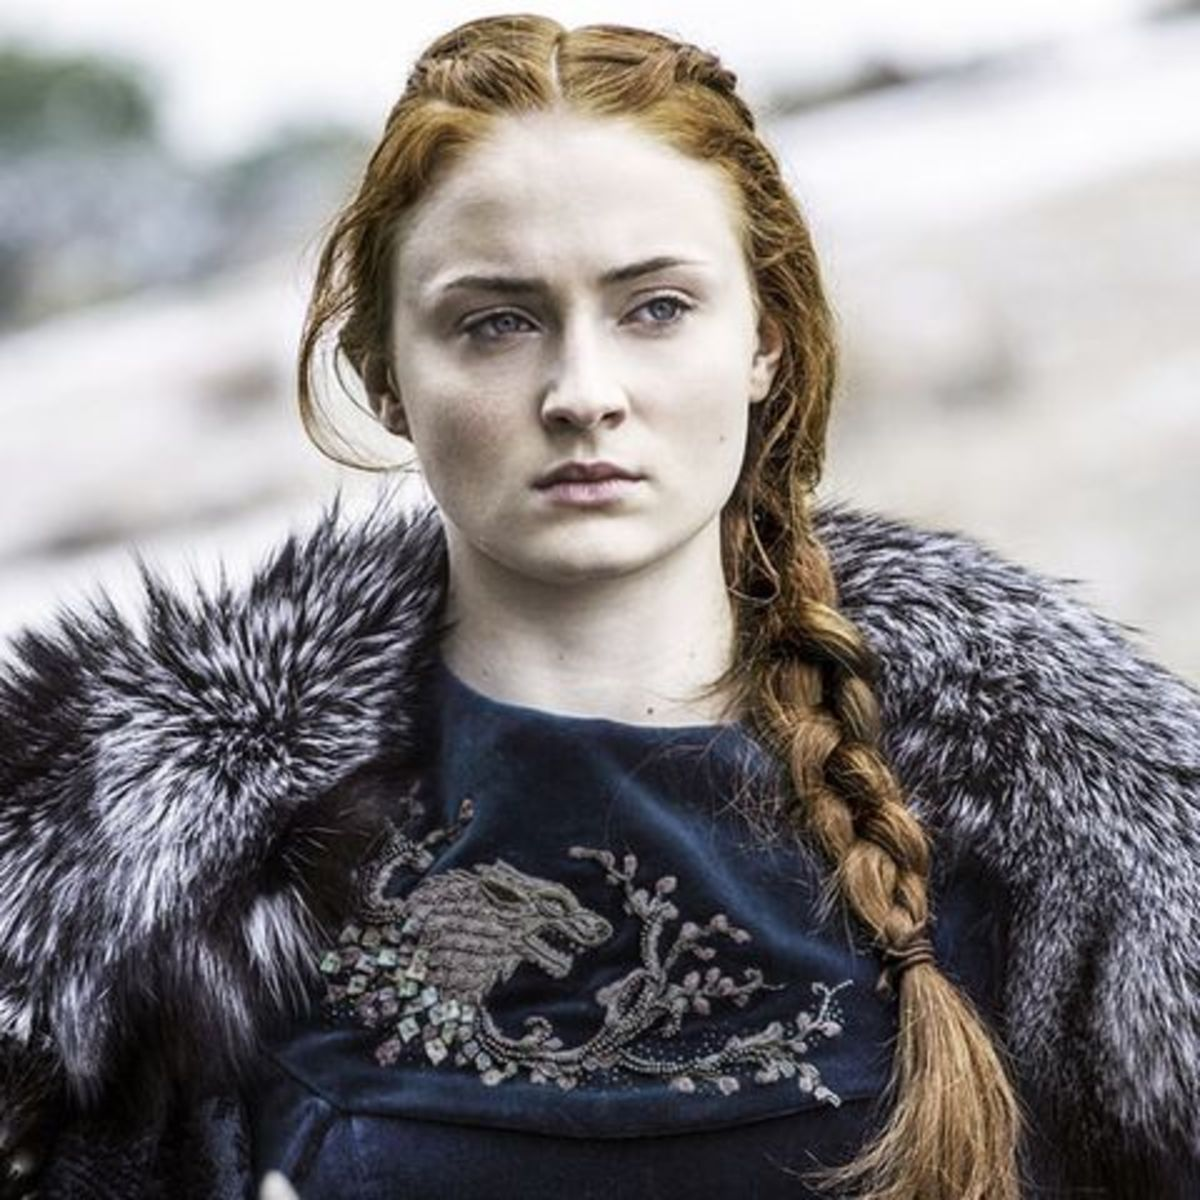 Courtesy of HBO.  Sansa at the Battle of the Bastards.